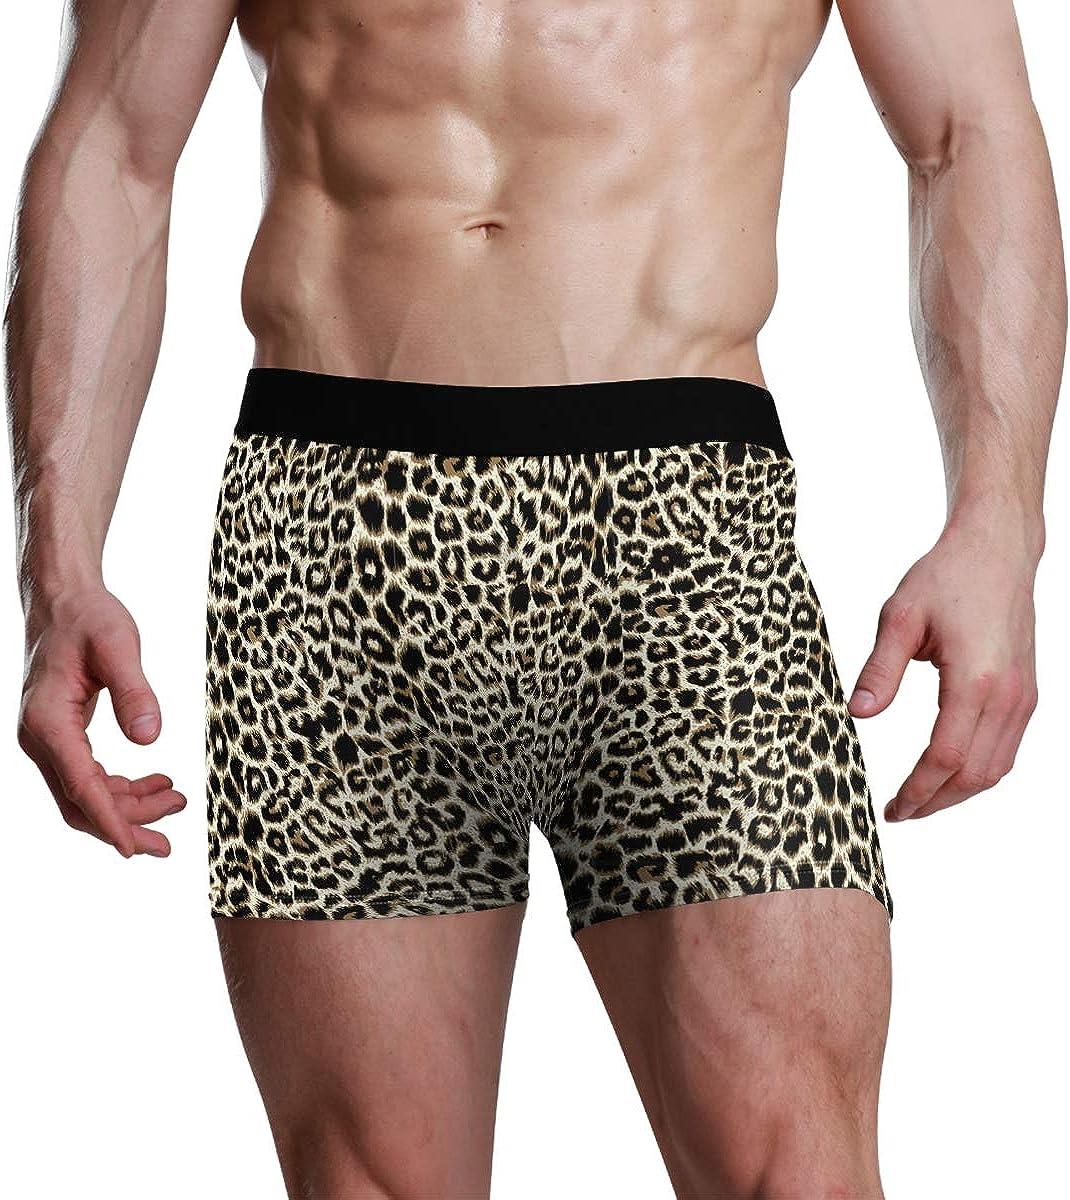 Mens Underwear Briefs Unique Leopard Print Breathable Long Boxer Briefs Underwear Boys